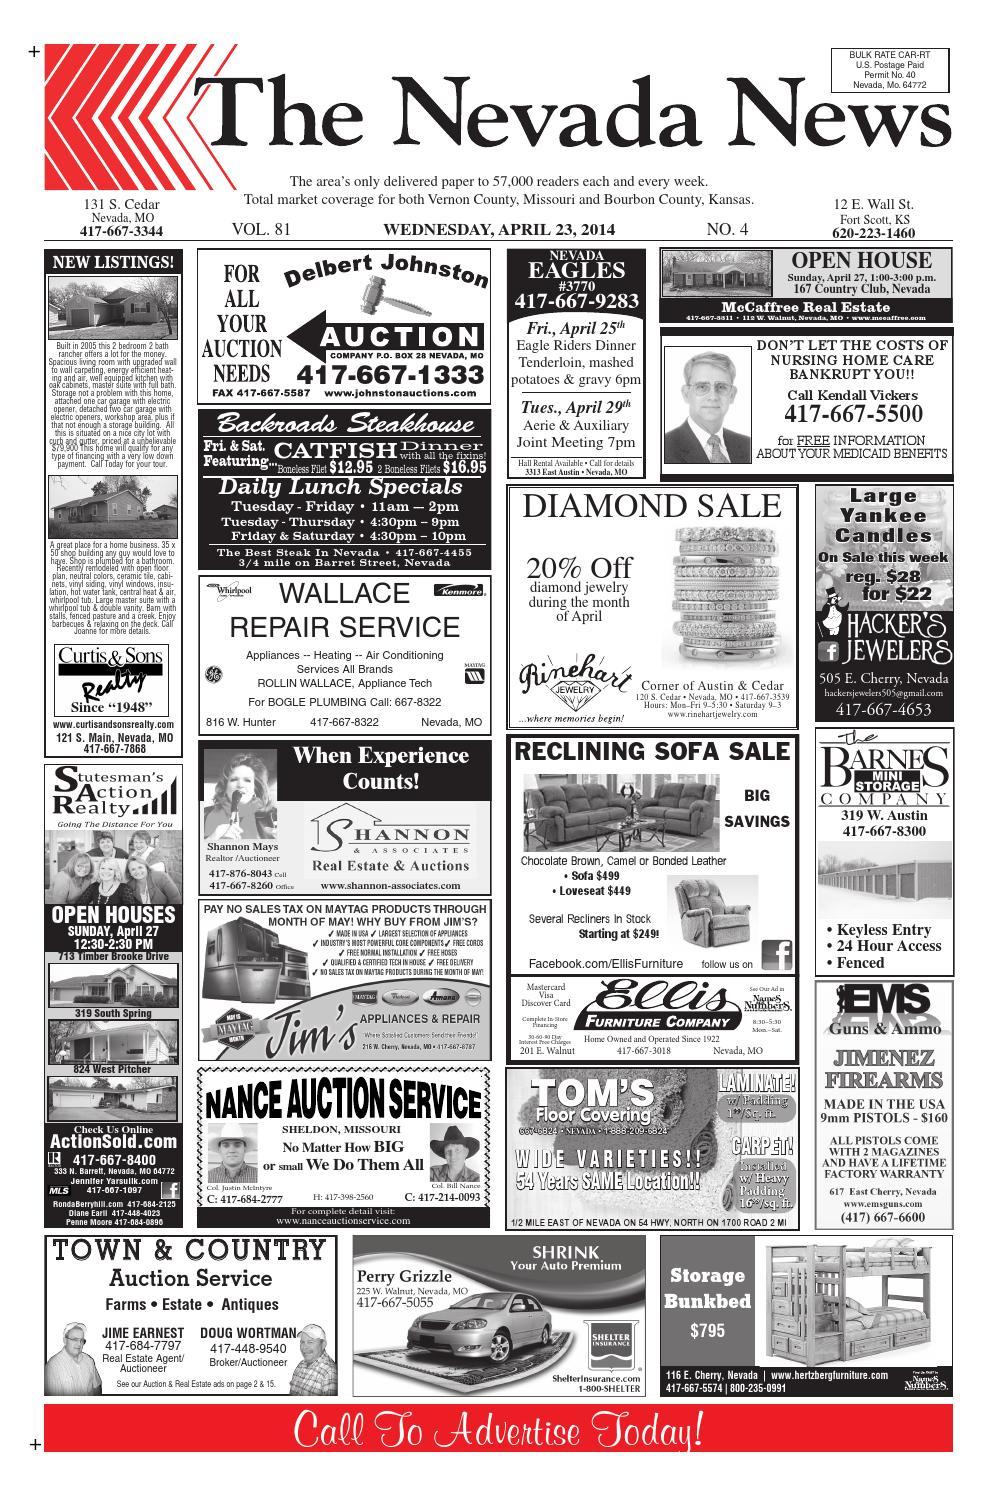 Sales Joe Pippin Auctioneers Wwwmiifotoscom